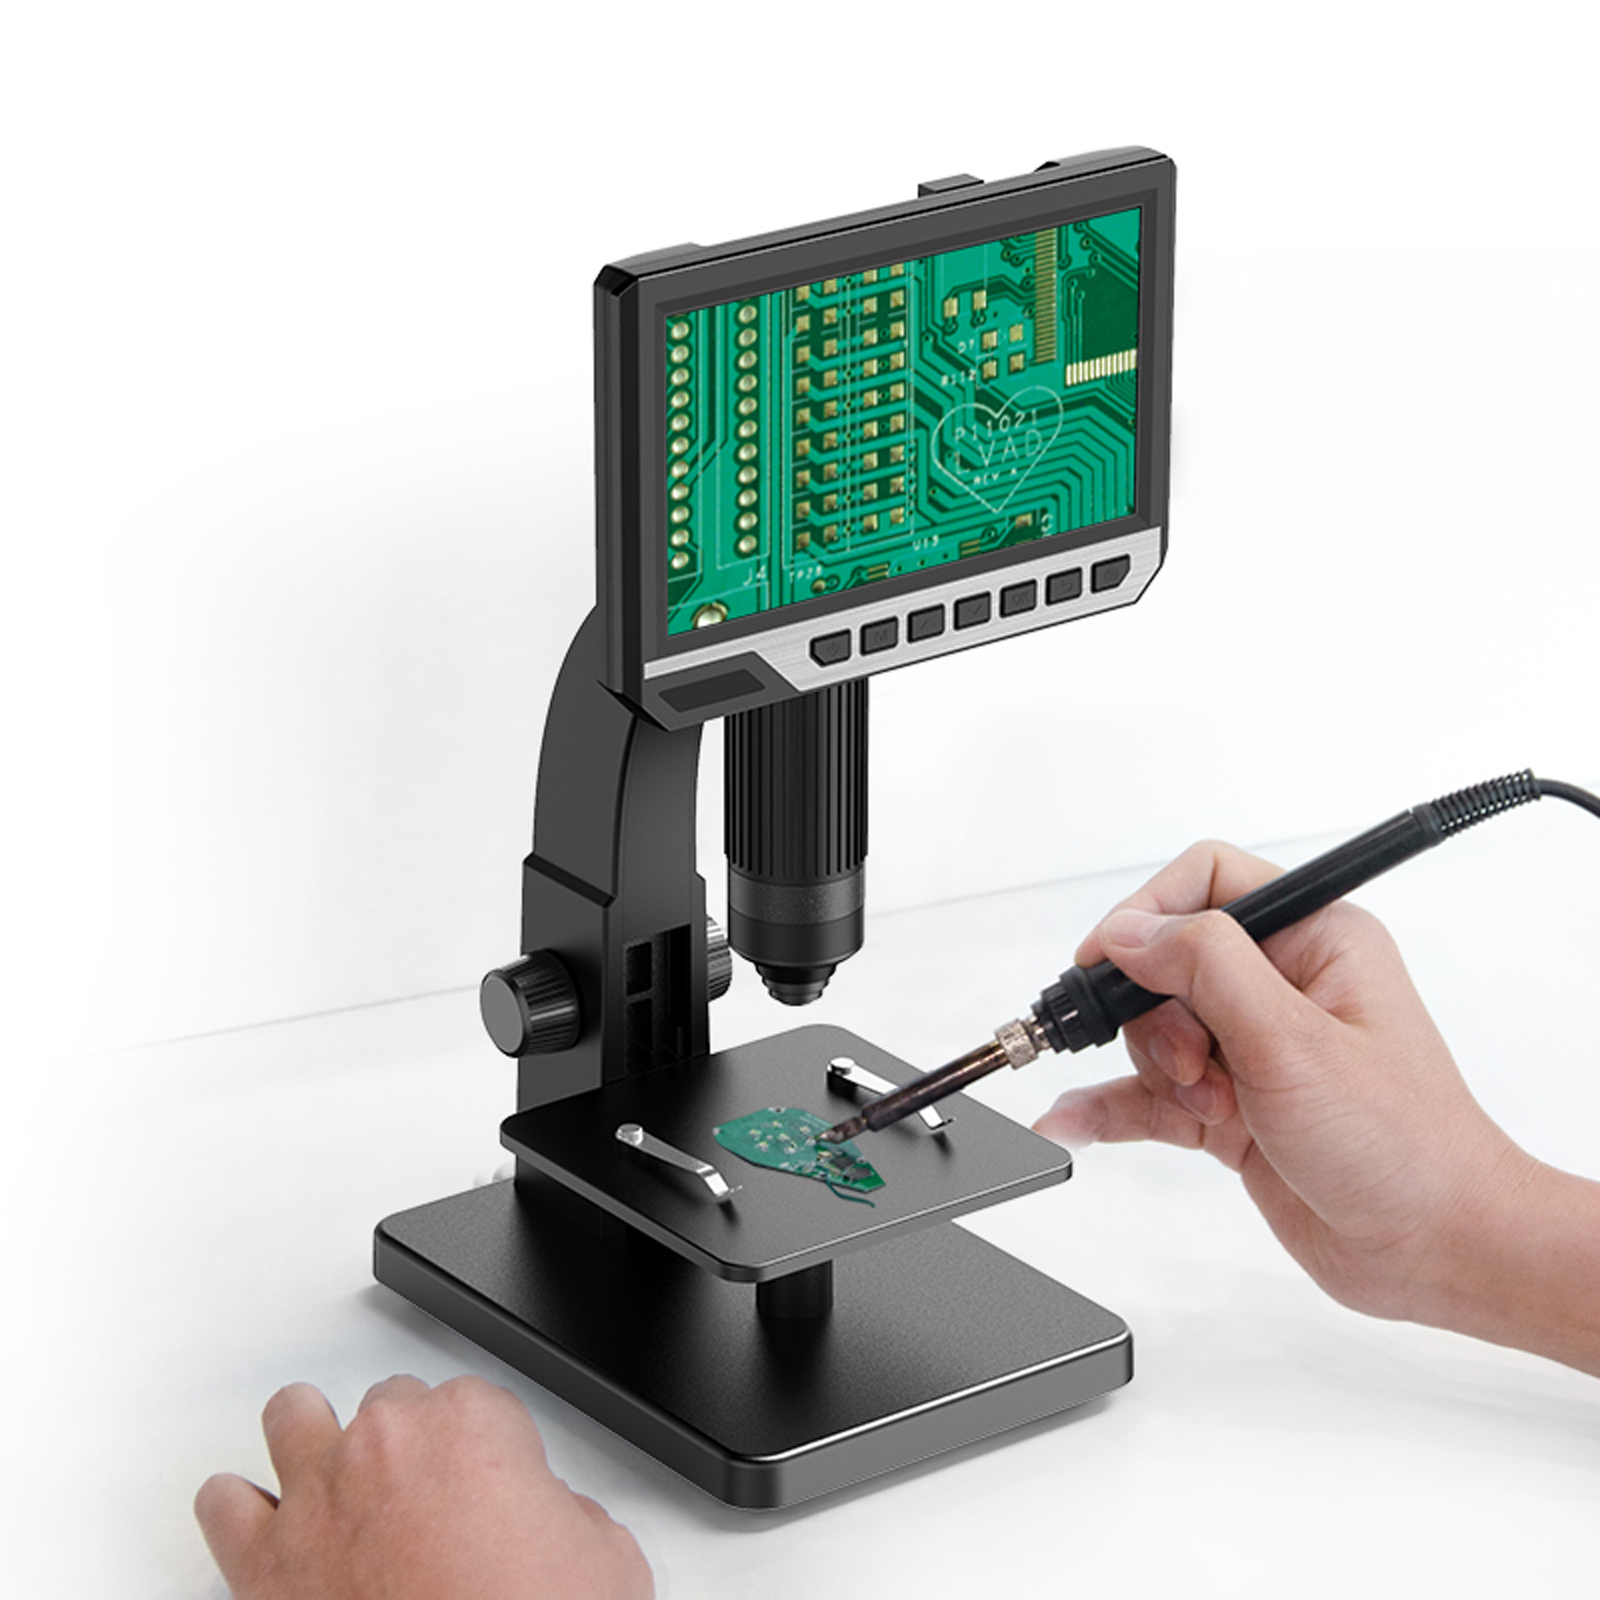 0 Light Tool Dual Inch LED 7 IPS Multipurpose Screen Source Digital Industrial Camera Inskam315 High Definition Microscope 2000x